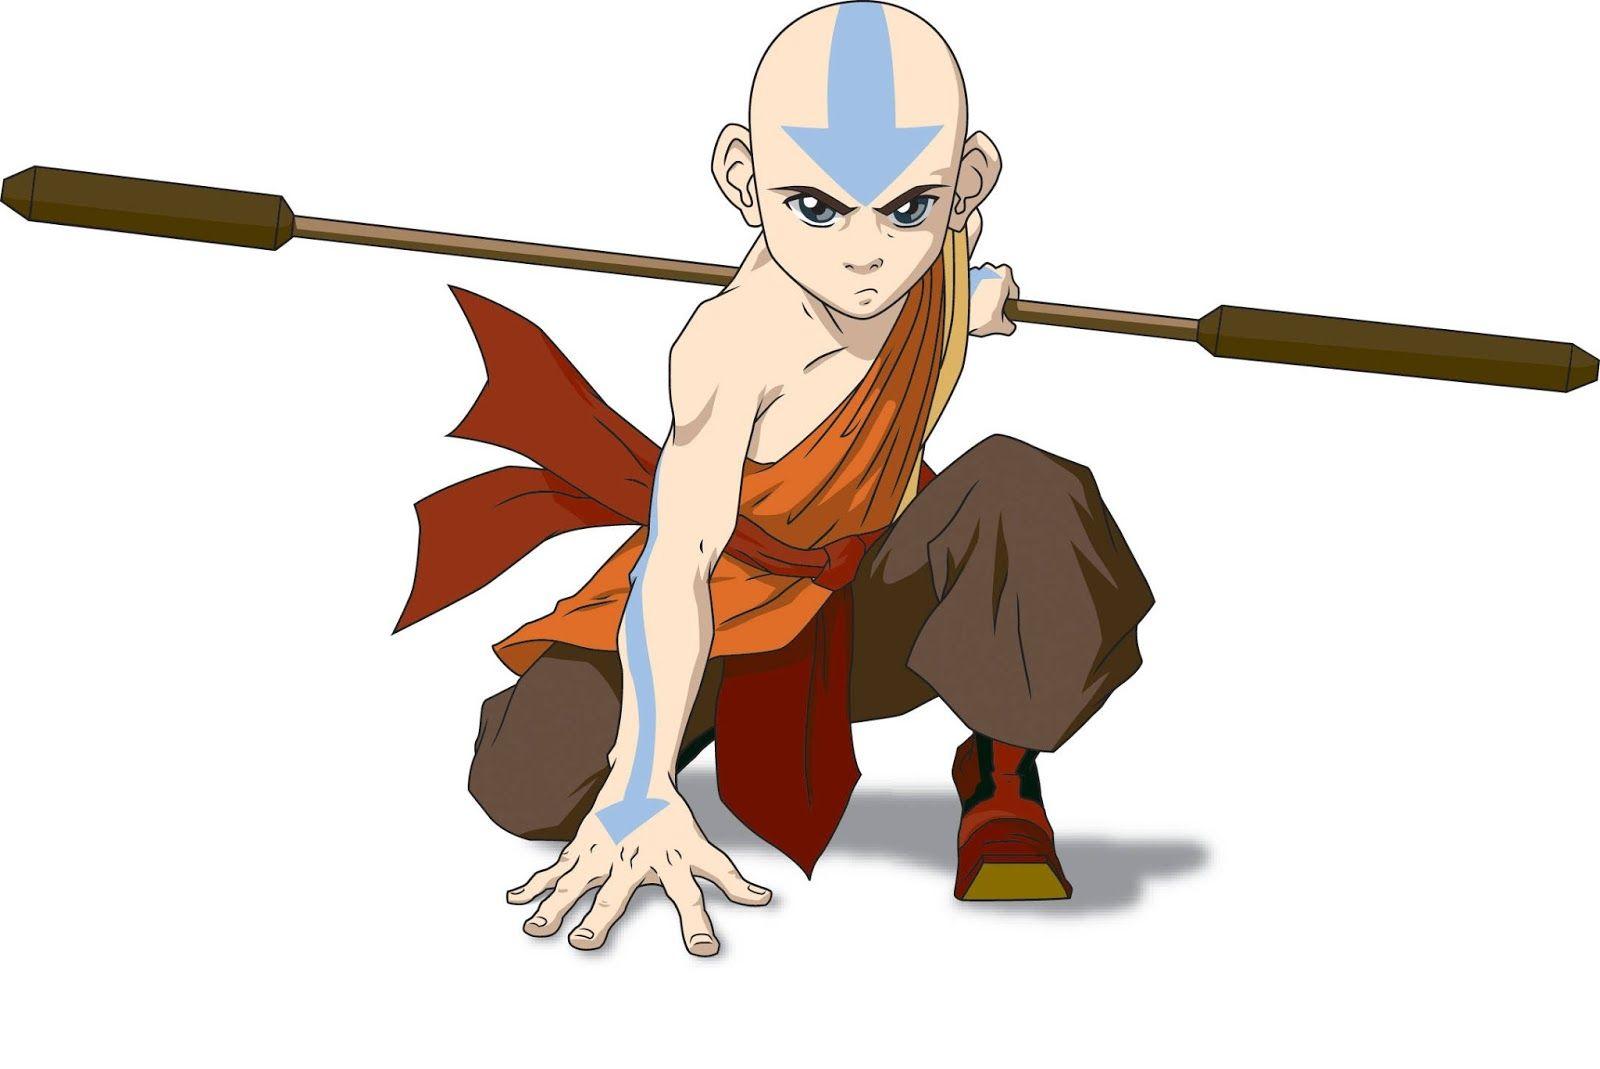 13 Mewarnai Gambar Avatar Aang Imagens